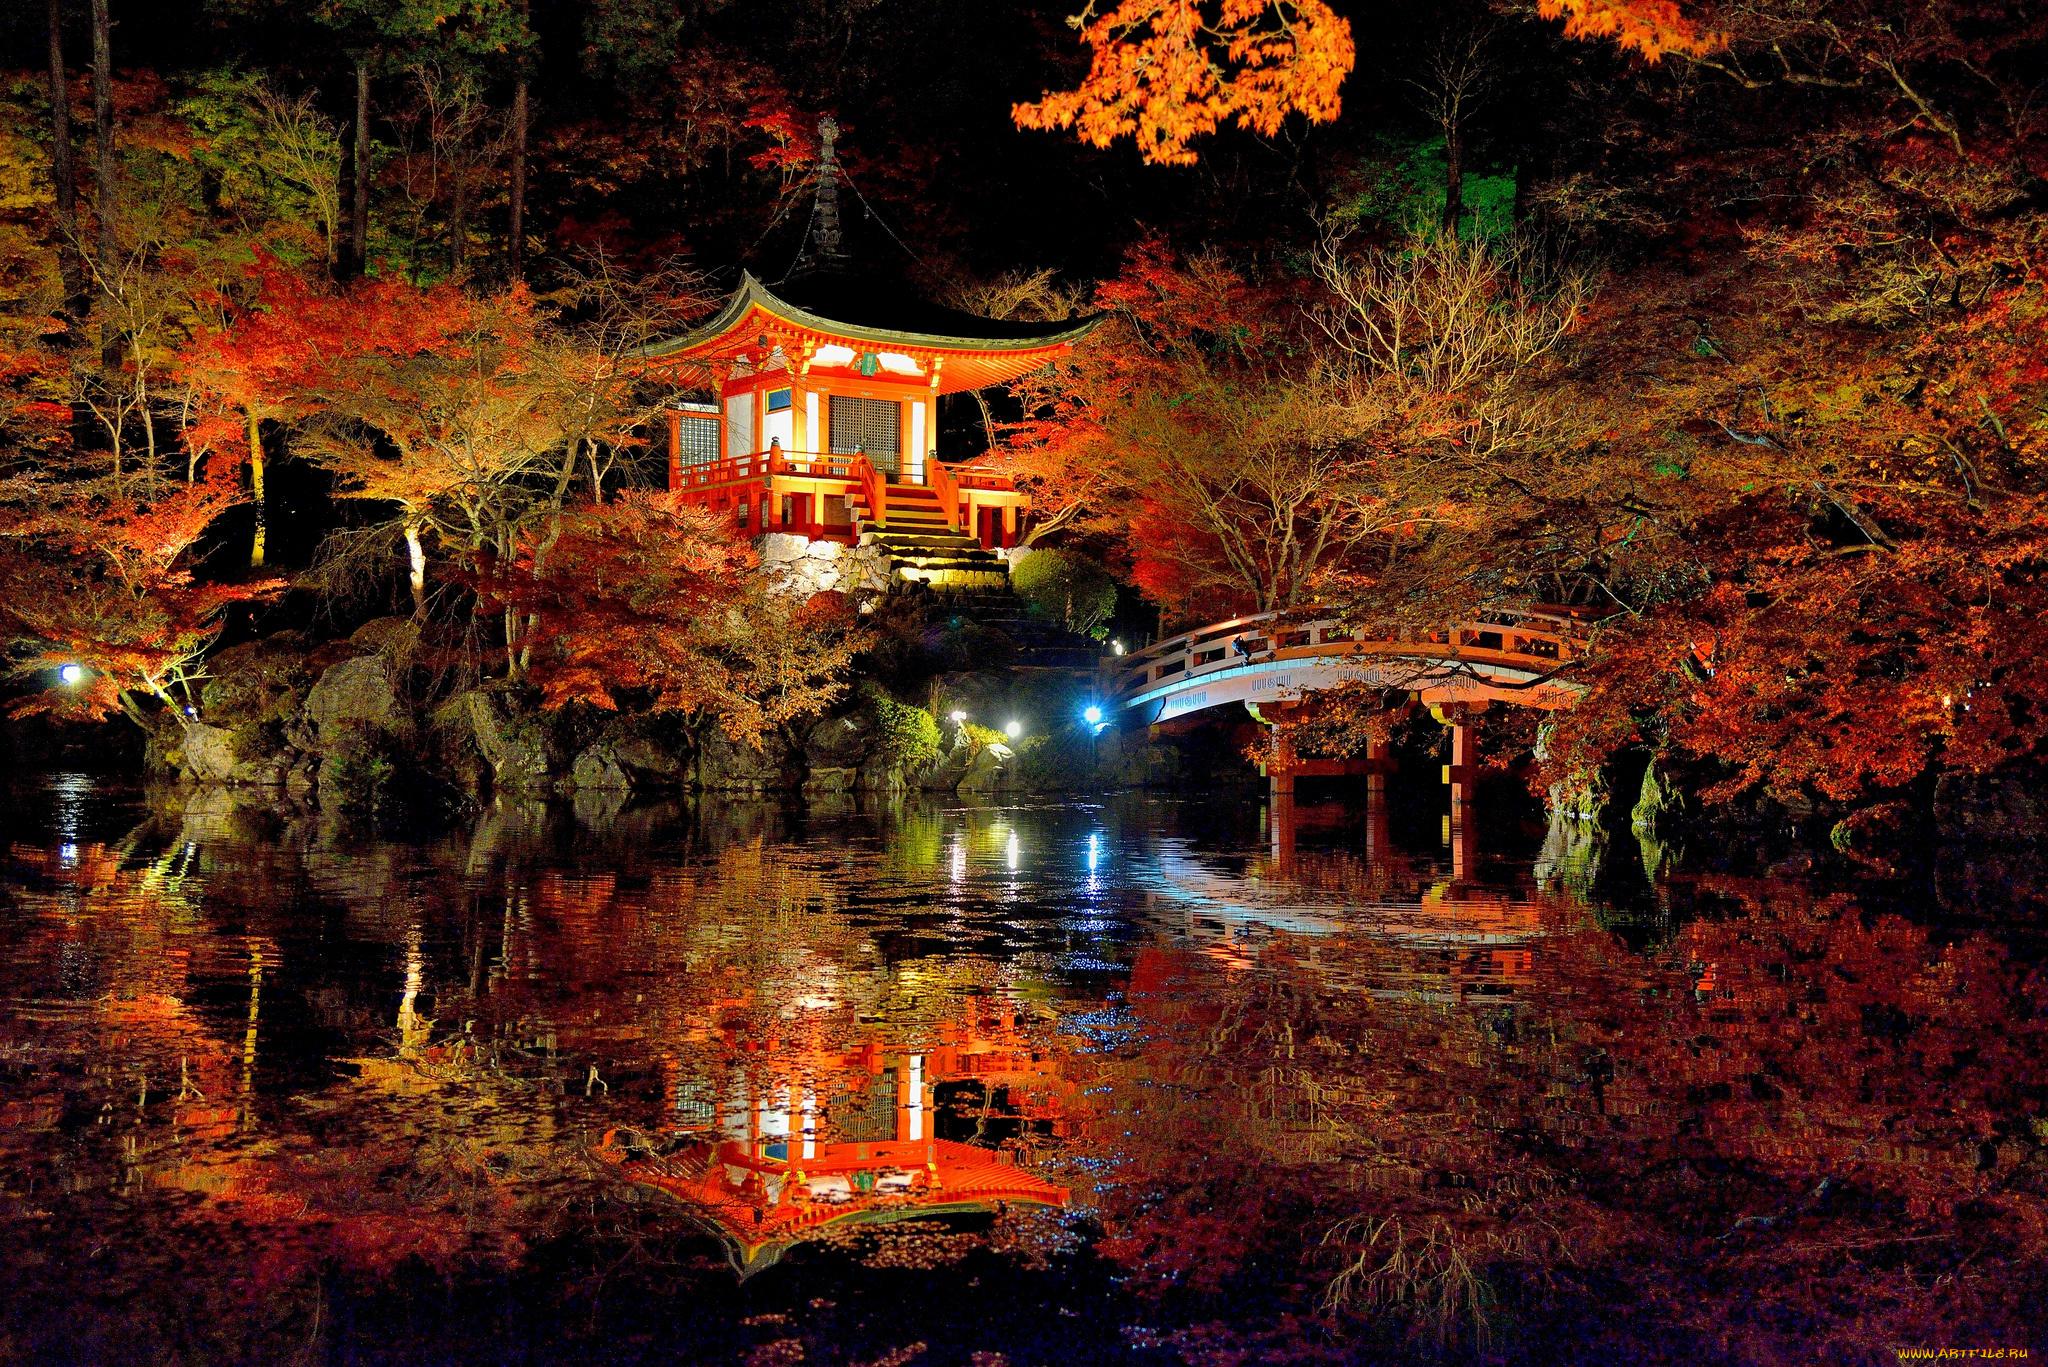 Running Stream Through a Japanese Beech Forest, Shirakami Sanchi, Japan бесплатно